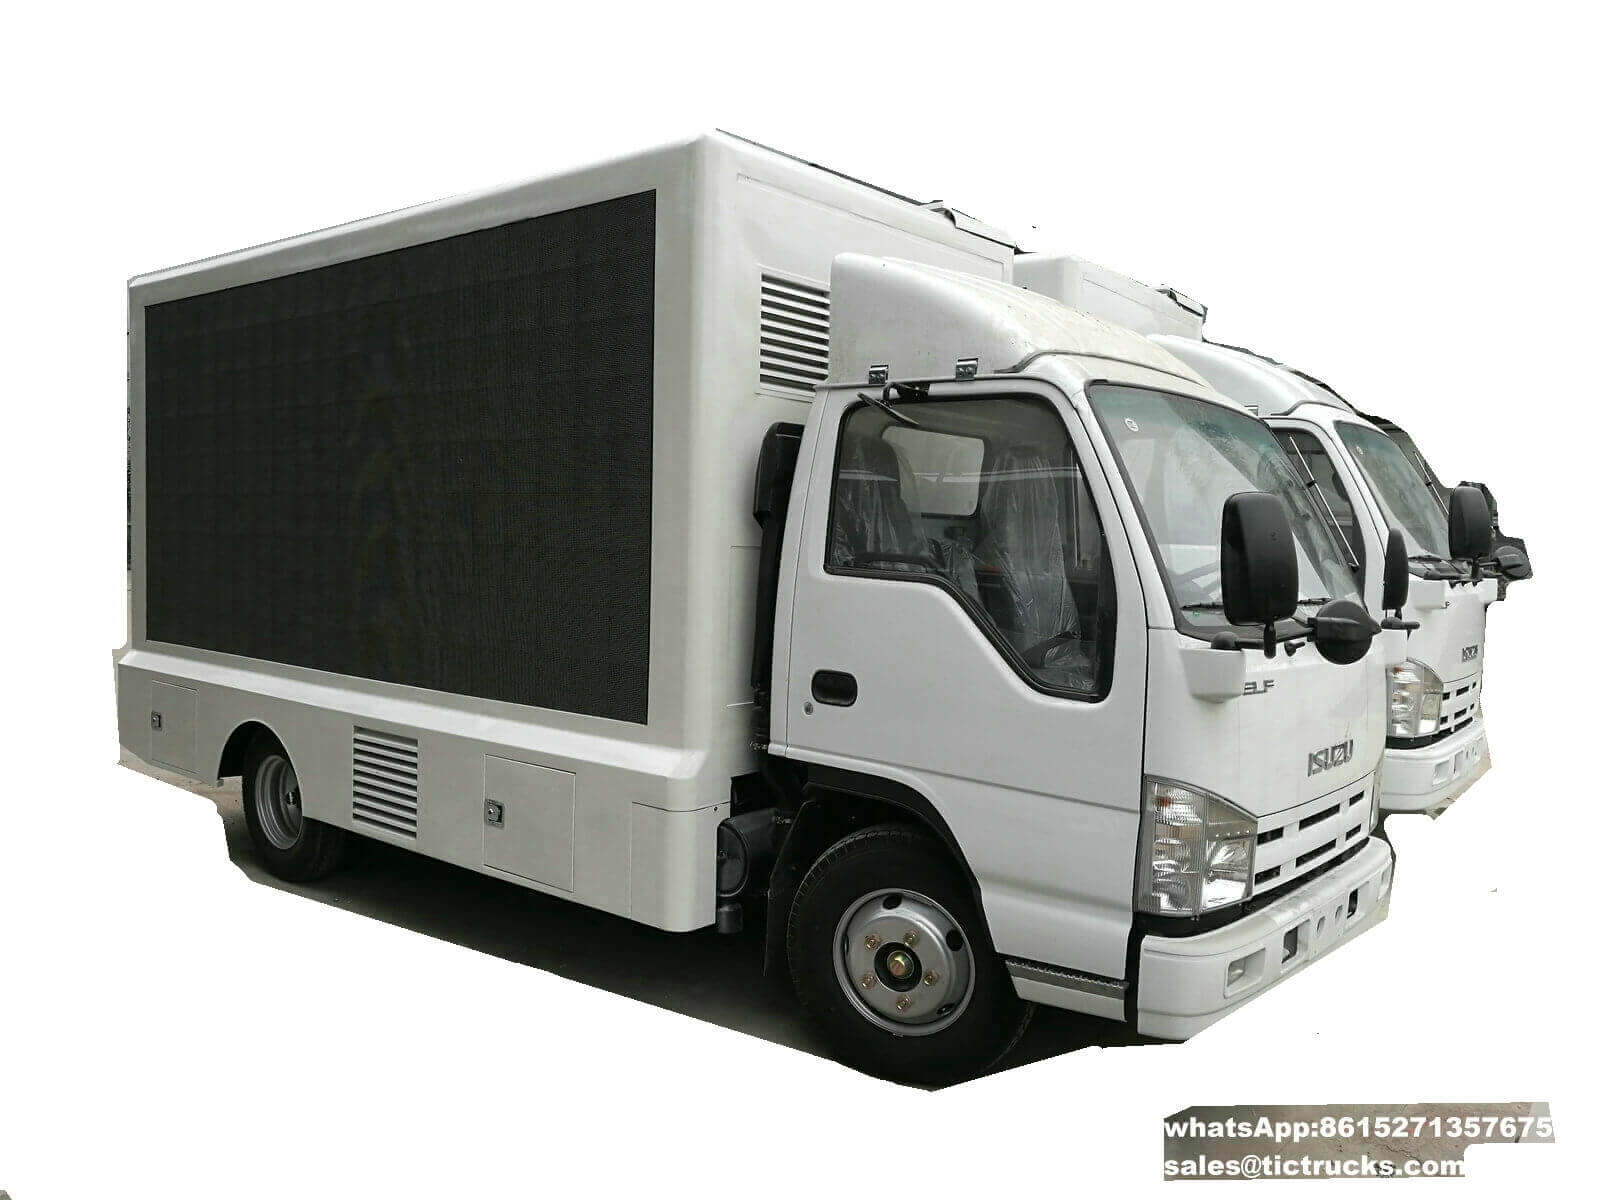 ISUZU LED truck -15_1.jpg